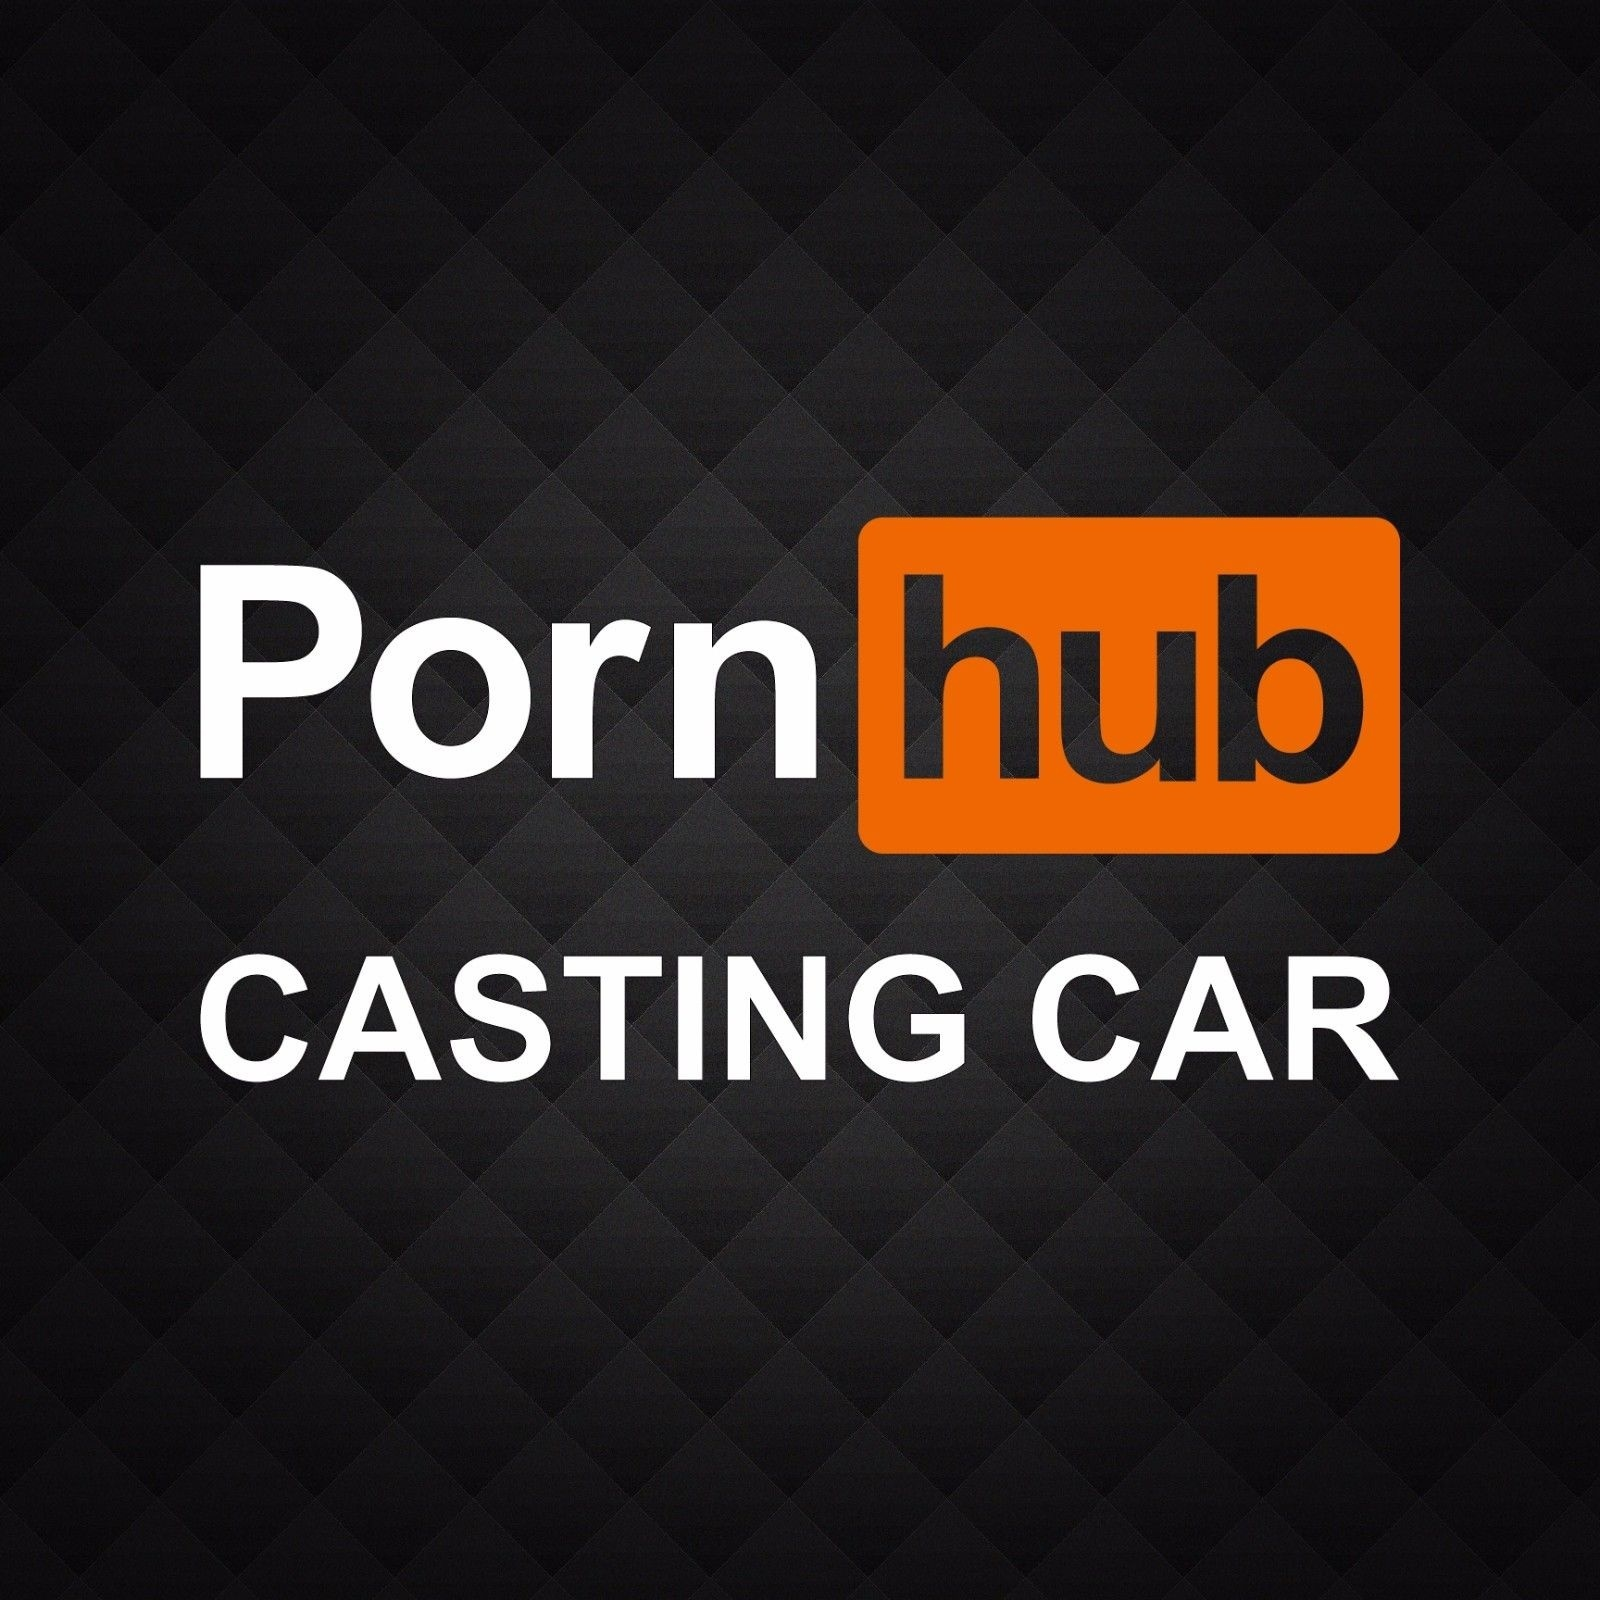 Stor porno hub